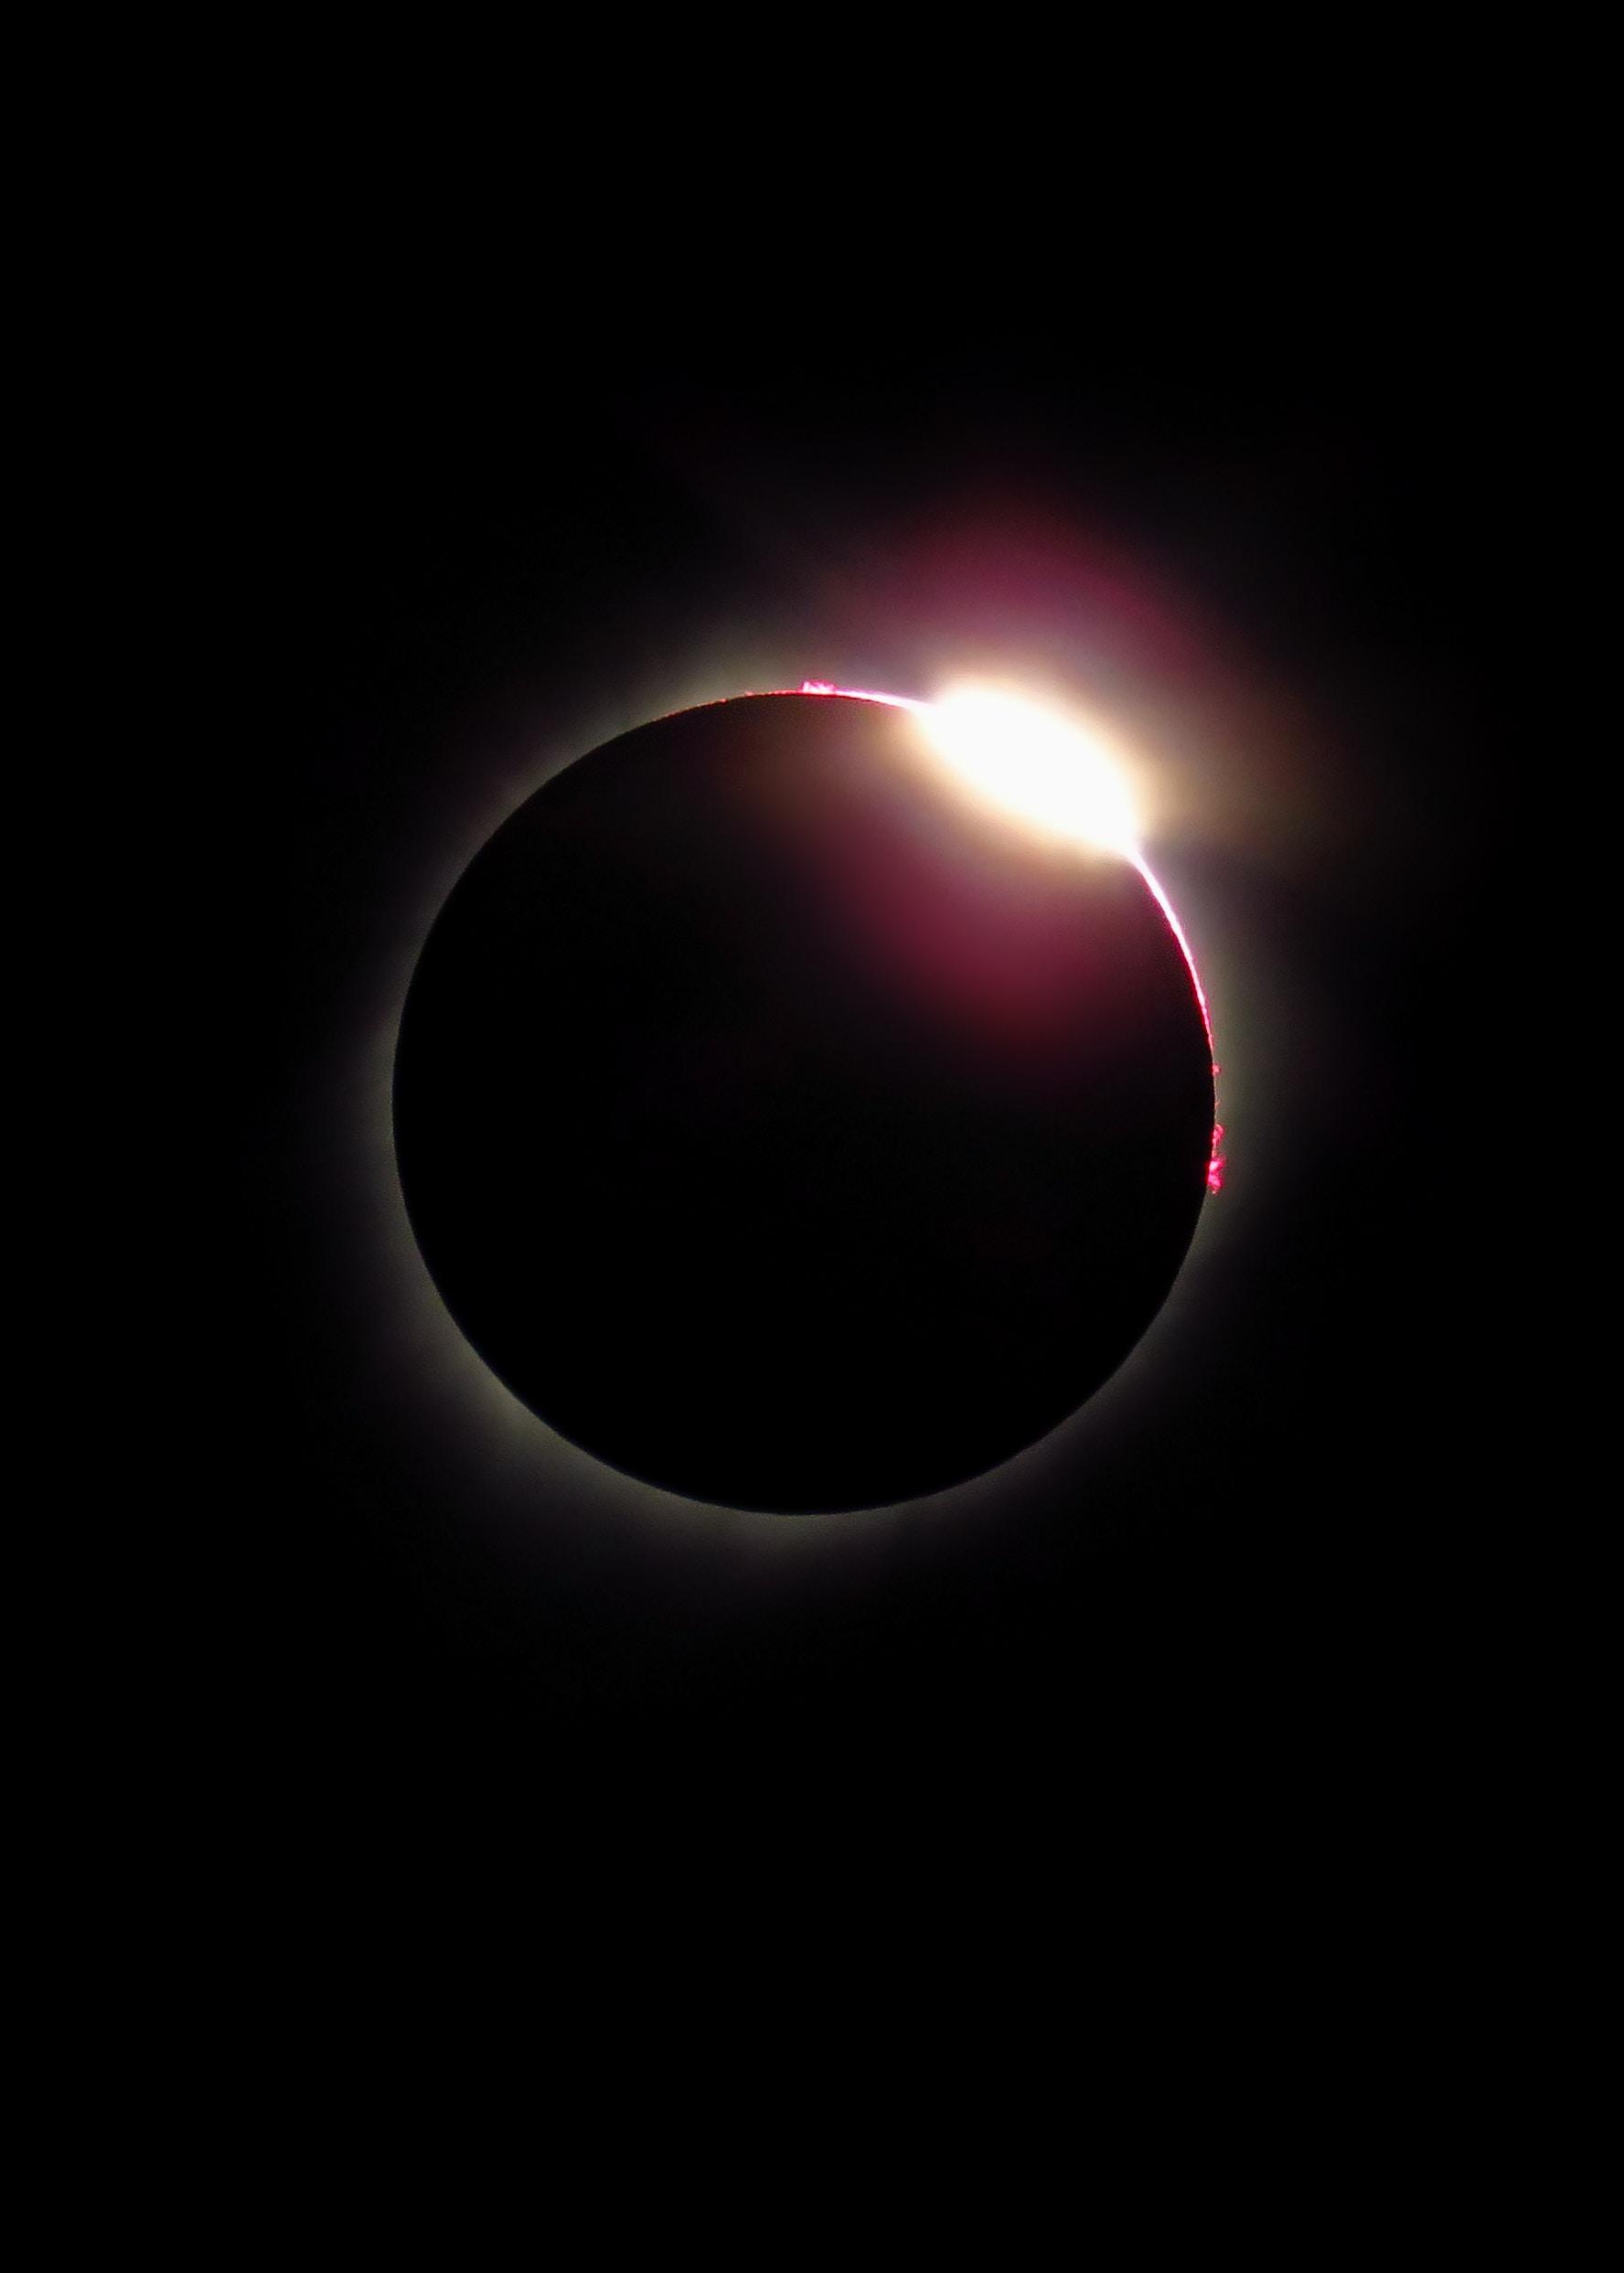 solar eclipse blogshawn-mcclure-526949.jpg